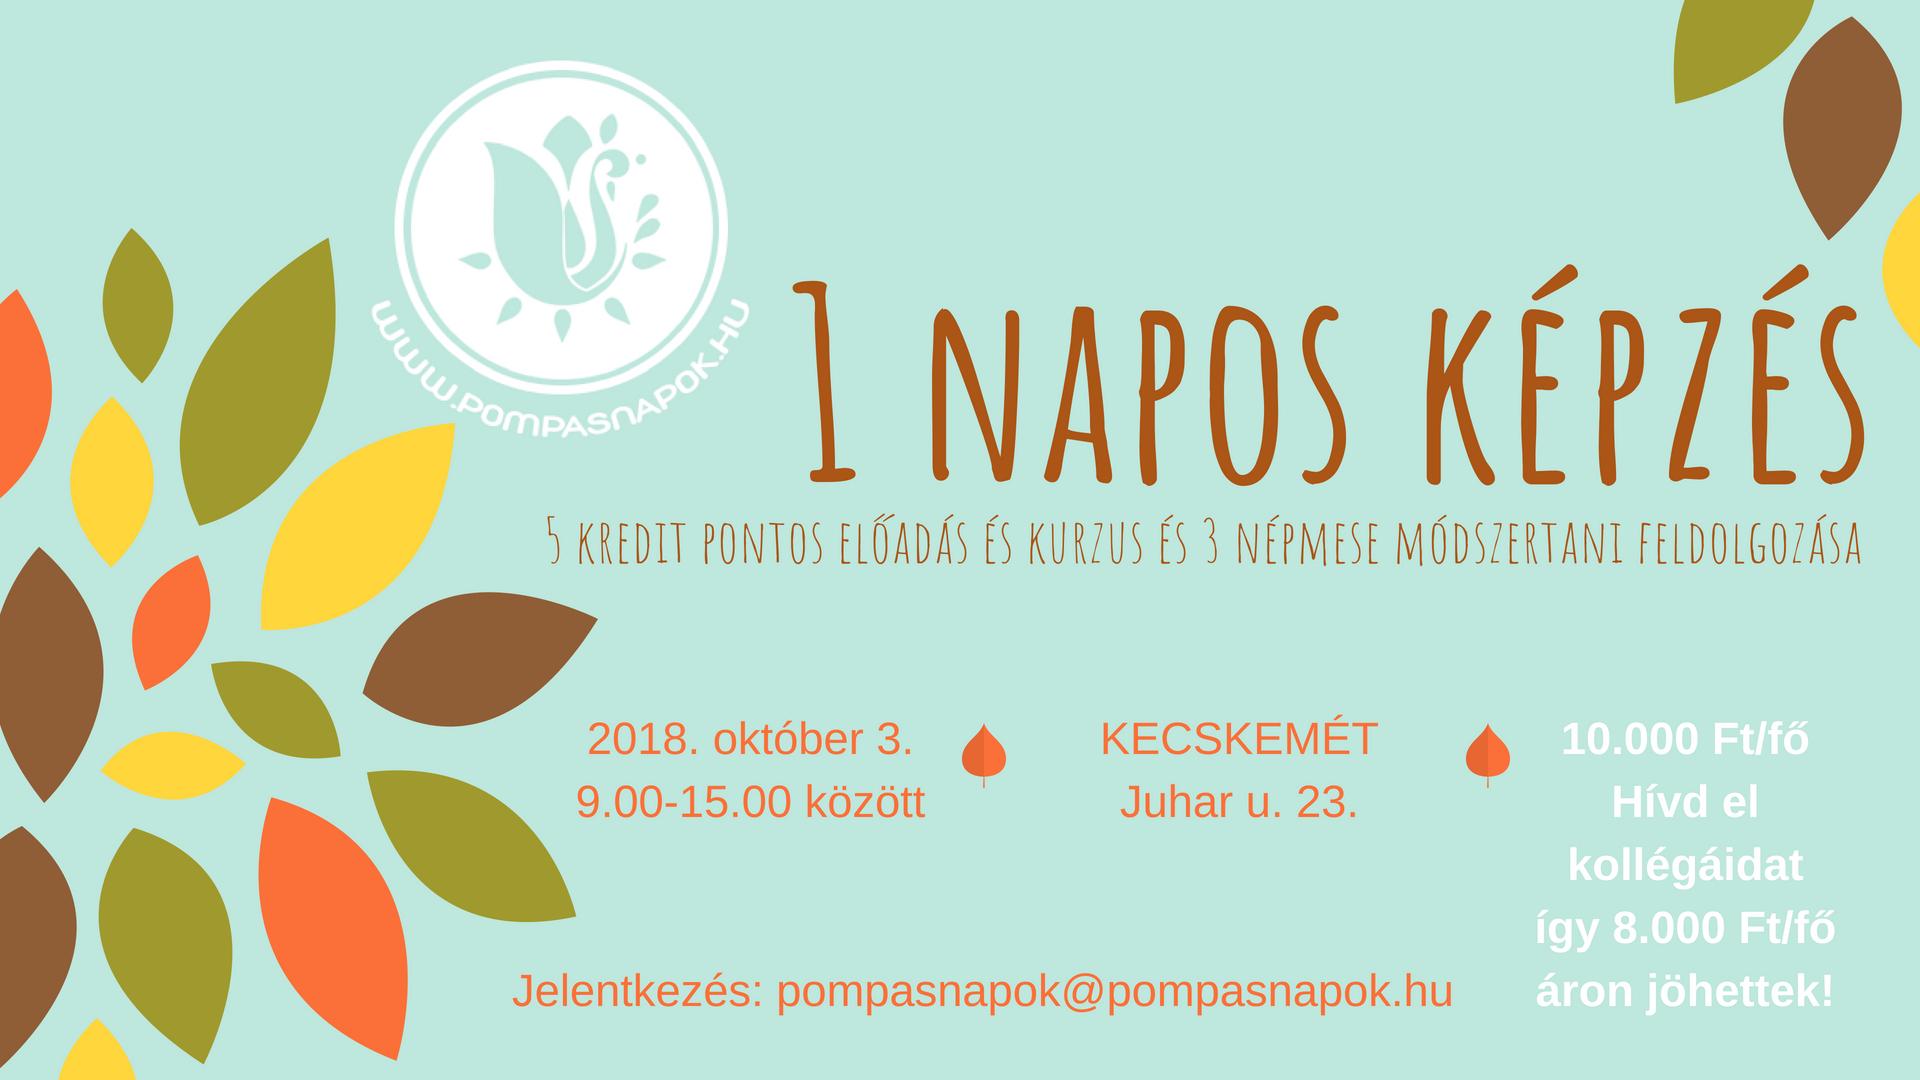 1_napos_kepzes_oktober_3_kecskemet_2.jpg